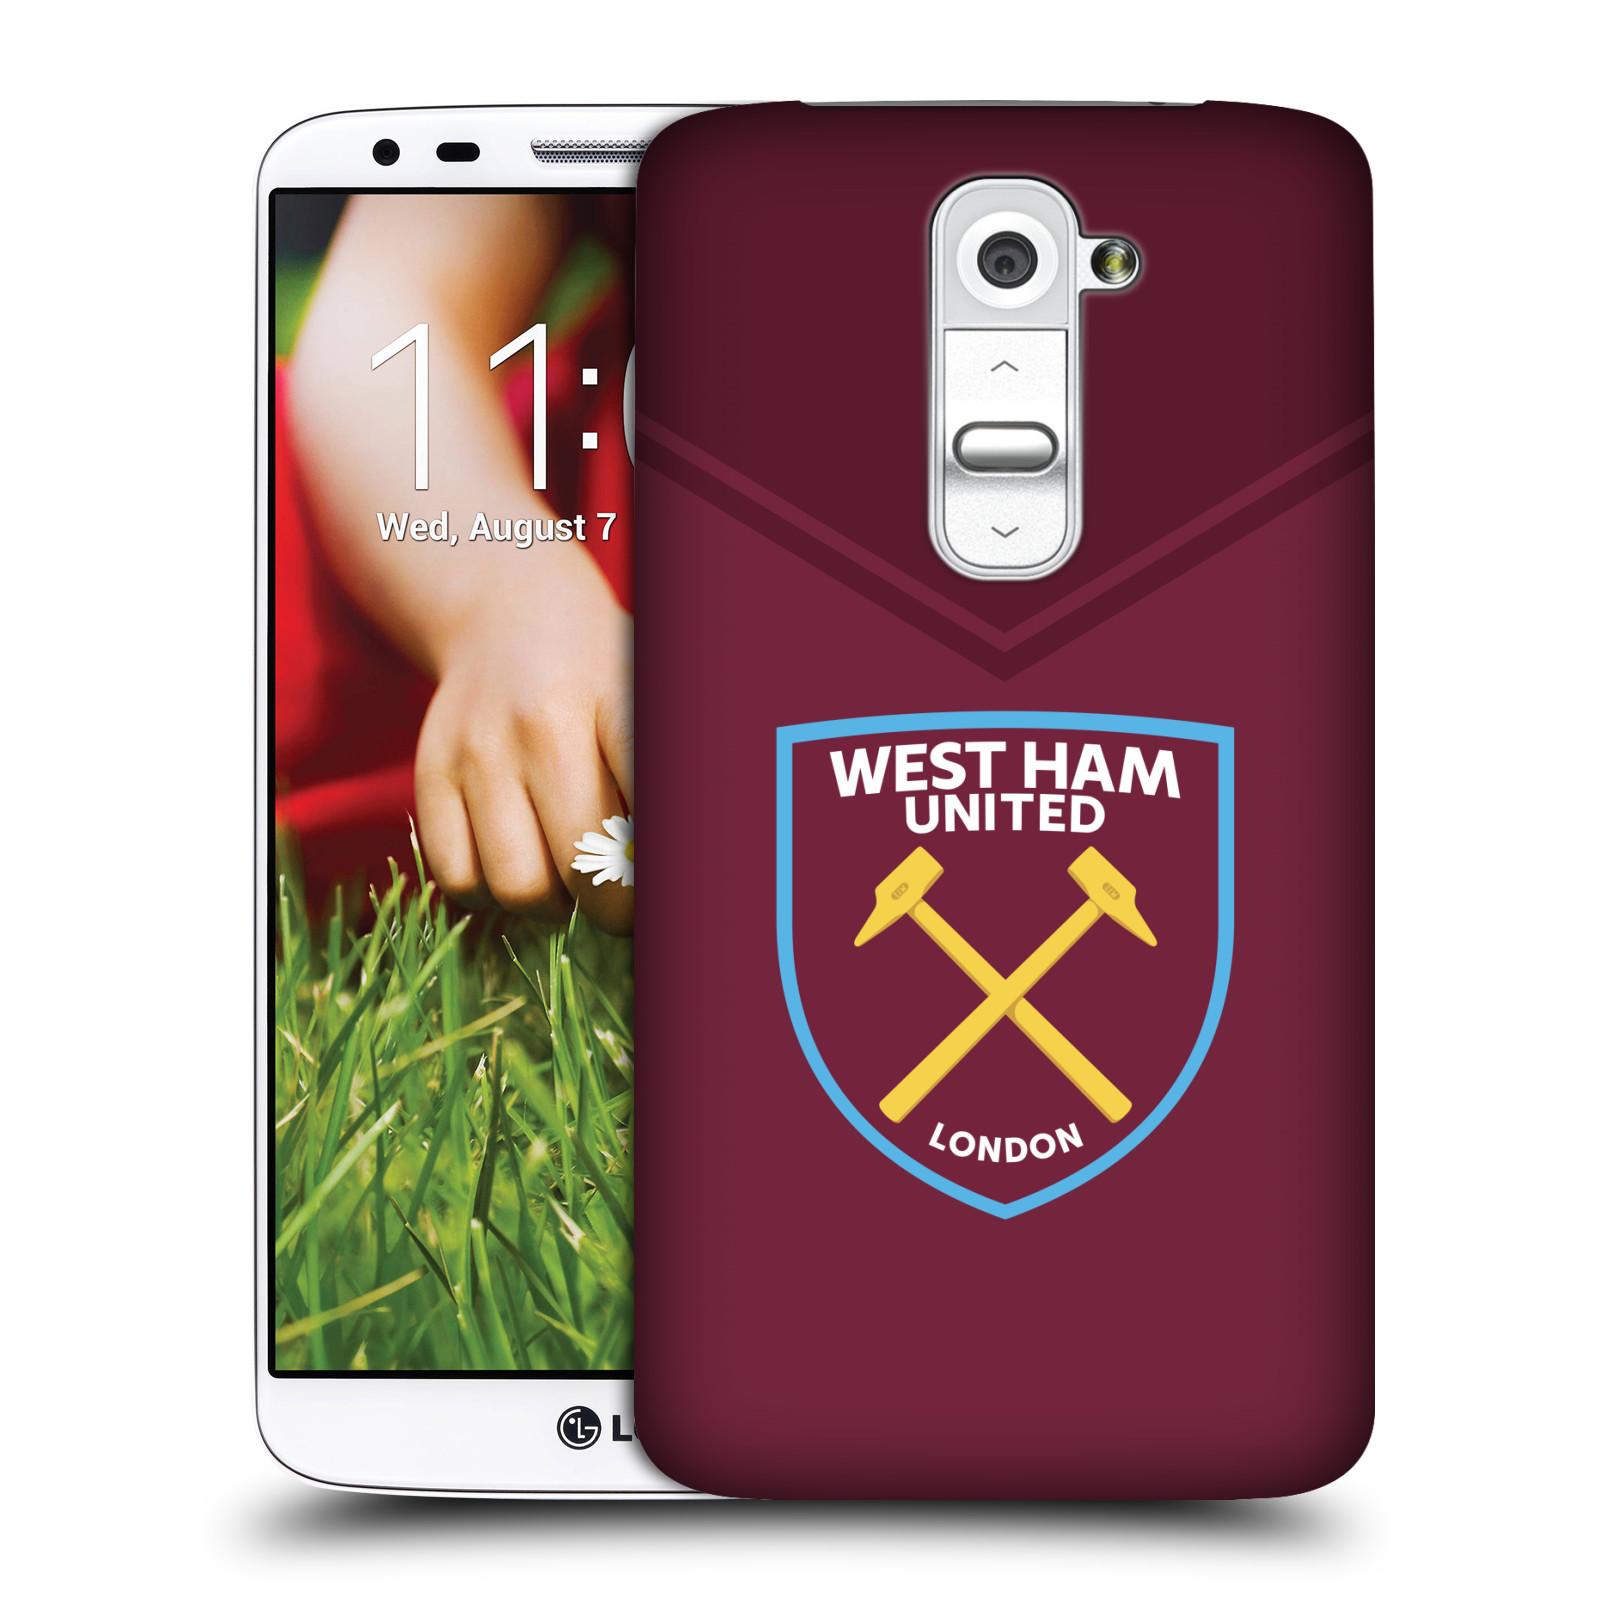 Plastové pouzdro na mobil LG G2 - Head Case - West Ham United - Logo